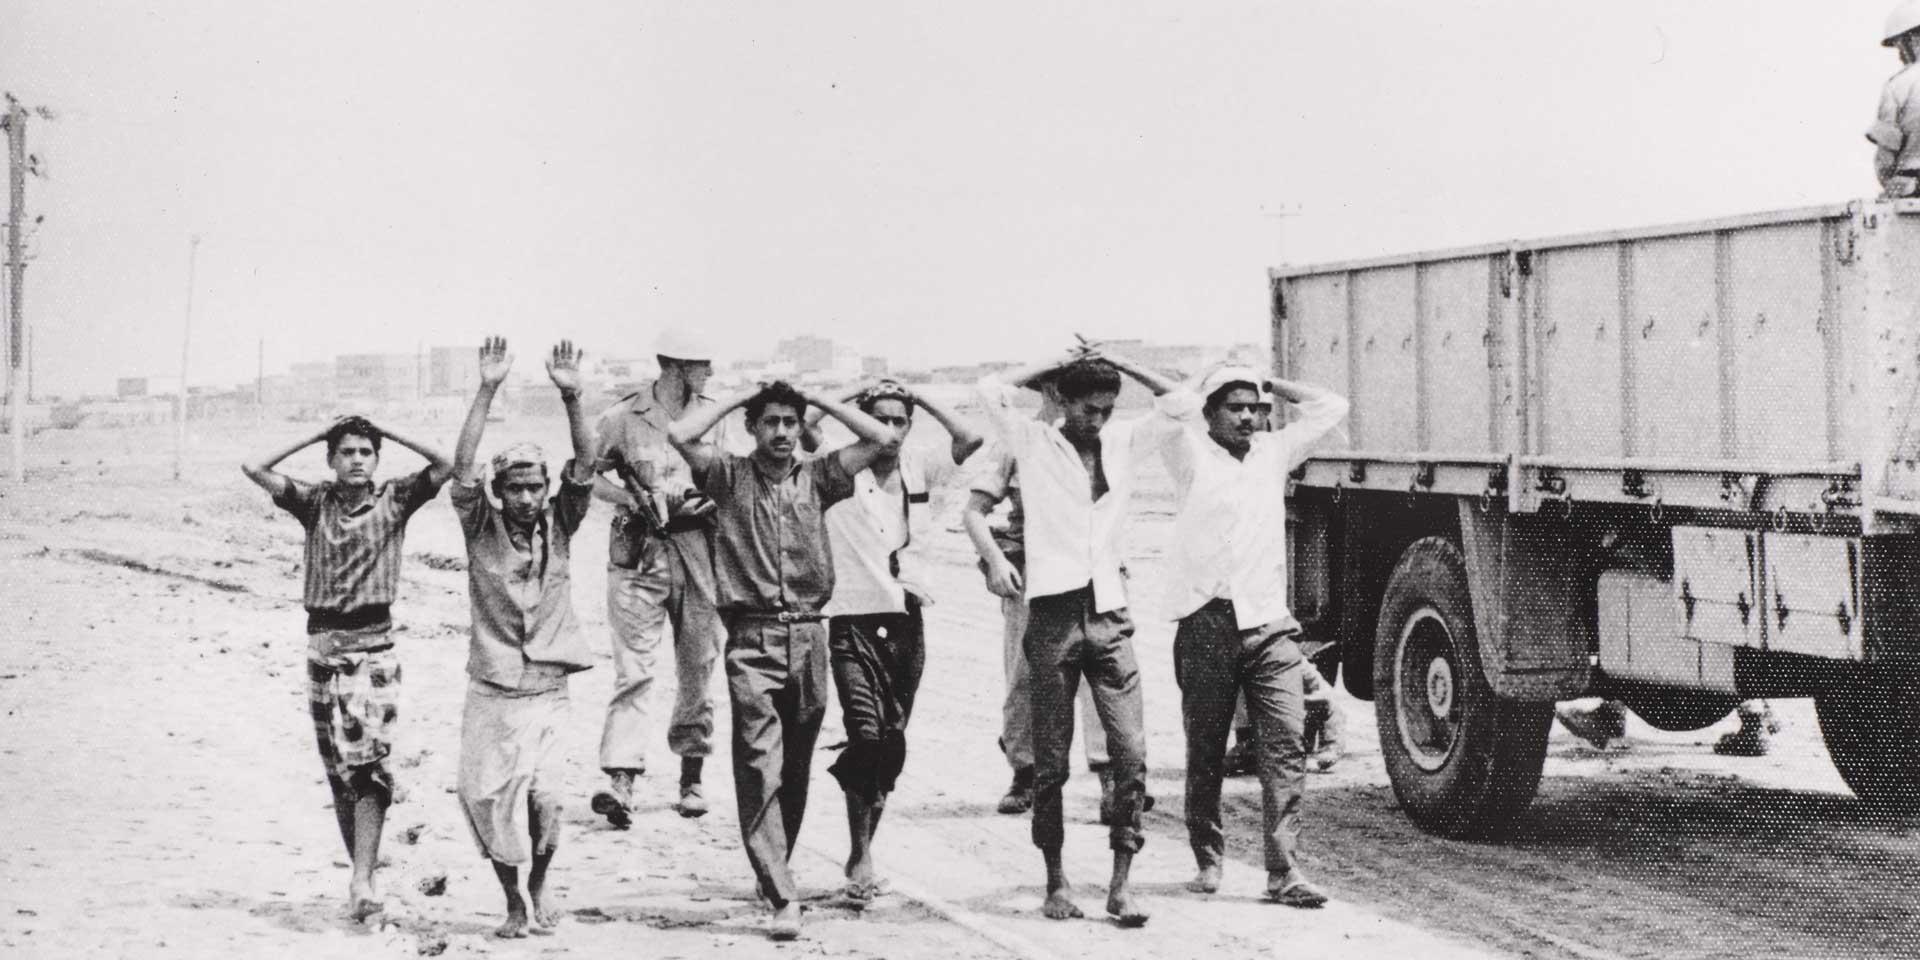 Rounding up suspects, Aden, 1967